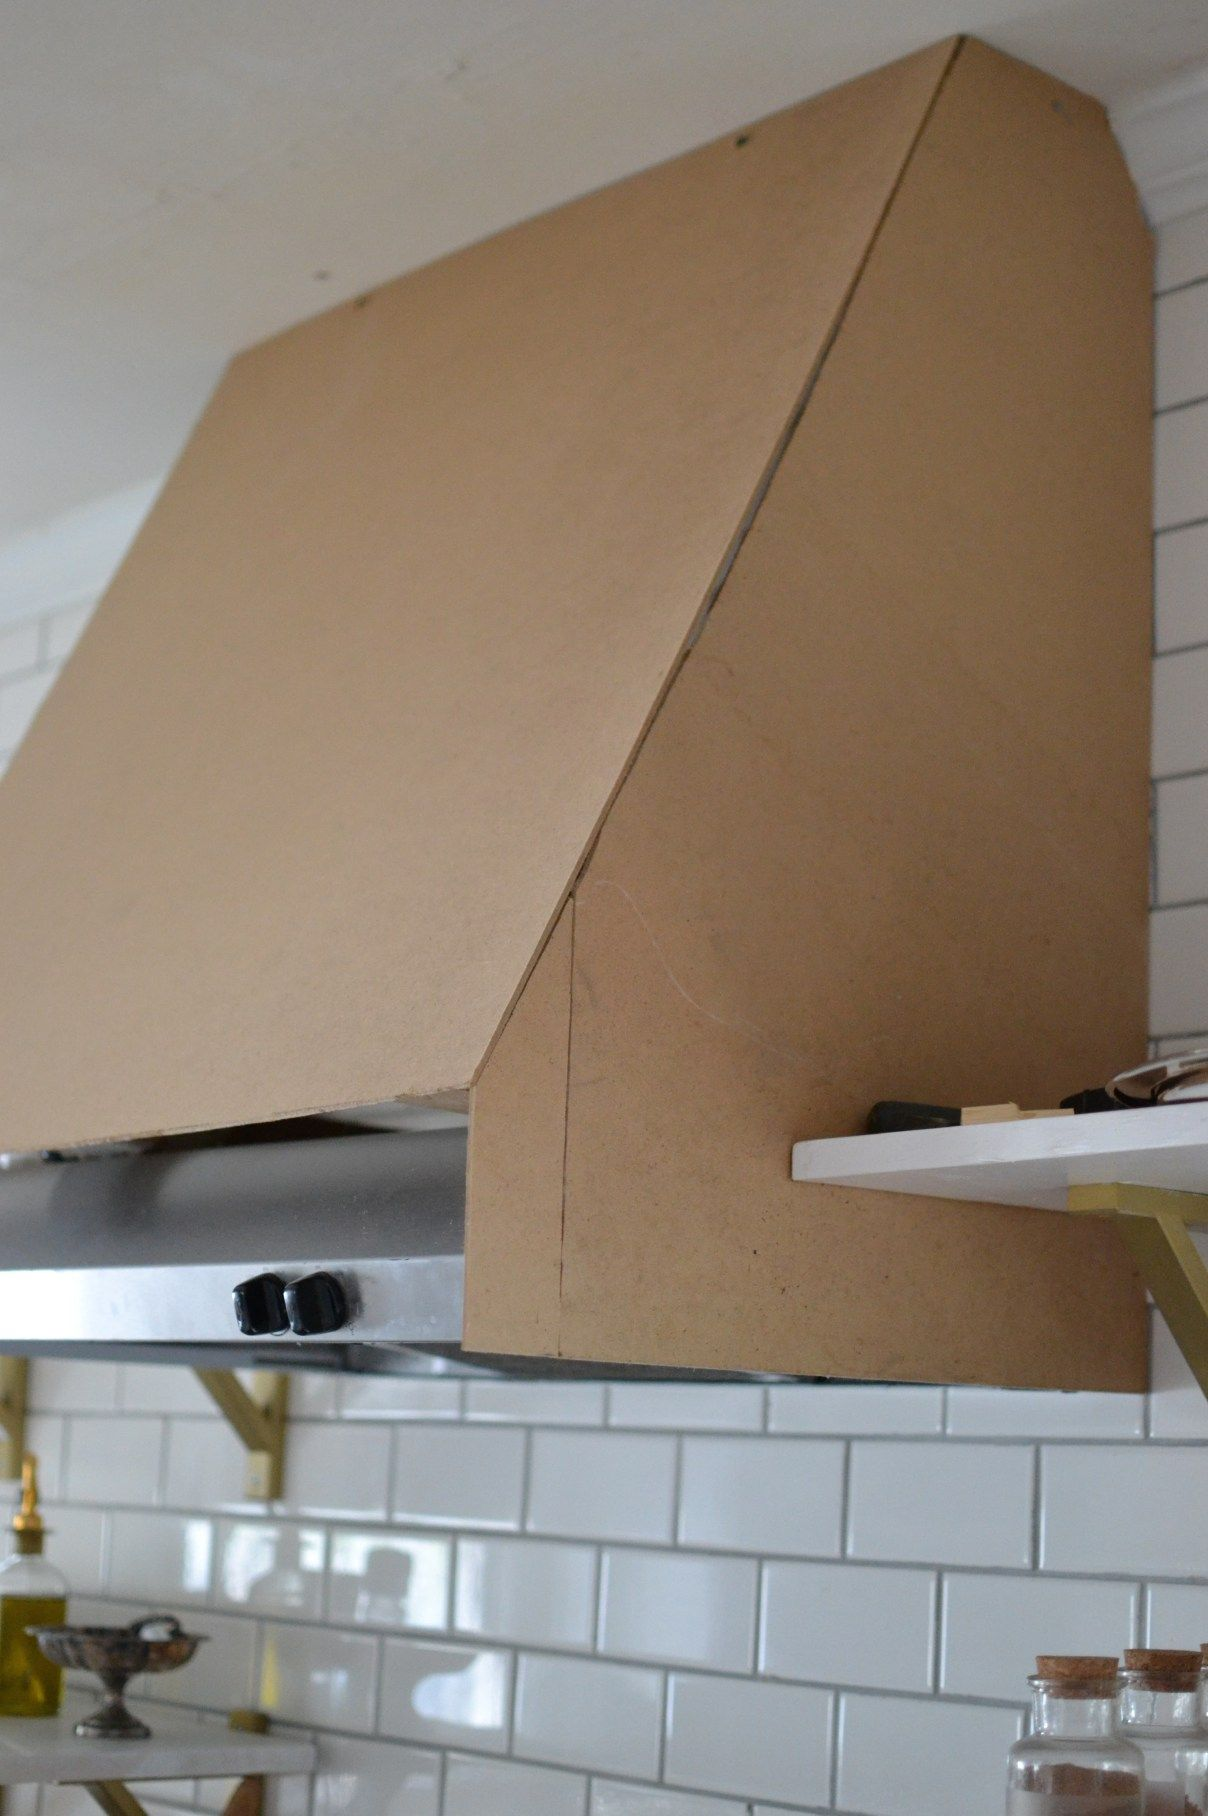 DIY Range Hood Cover | kitchen vent Hood with shelving | Pinterest ...